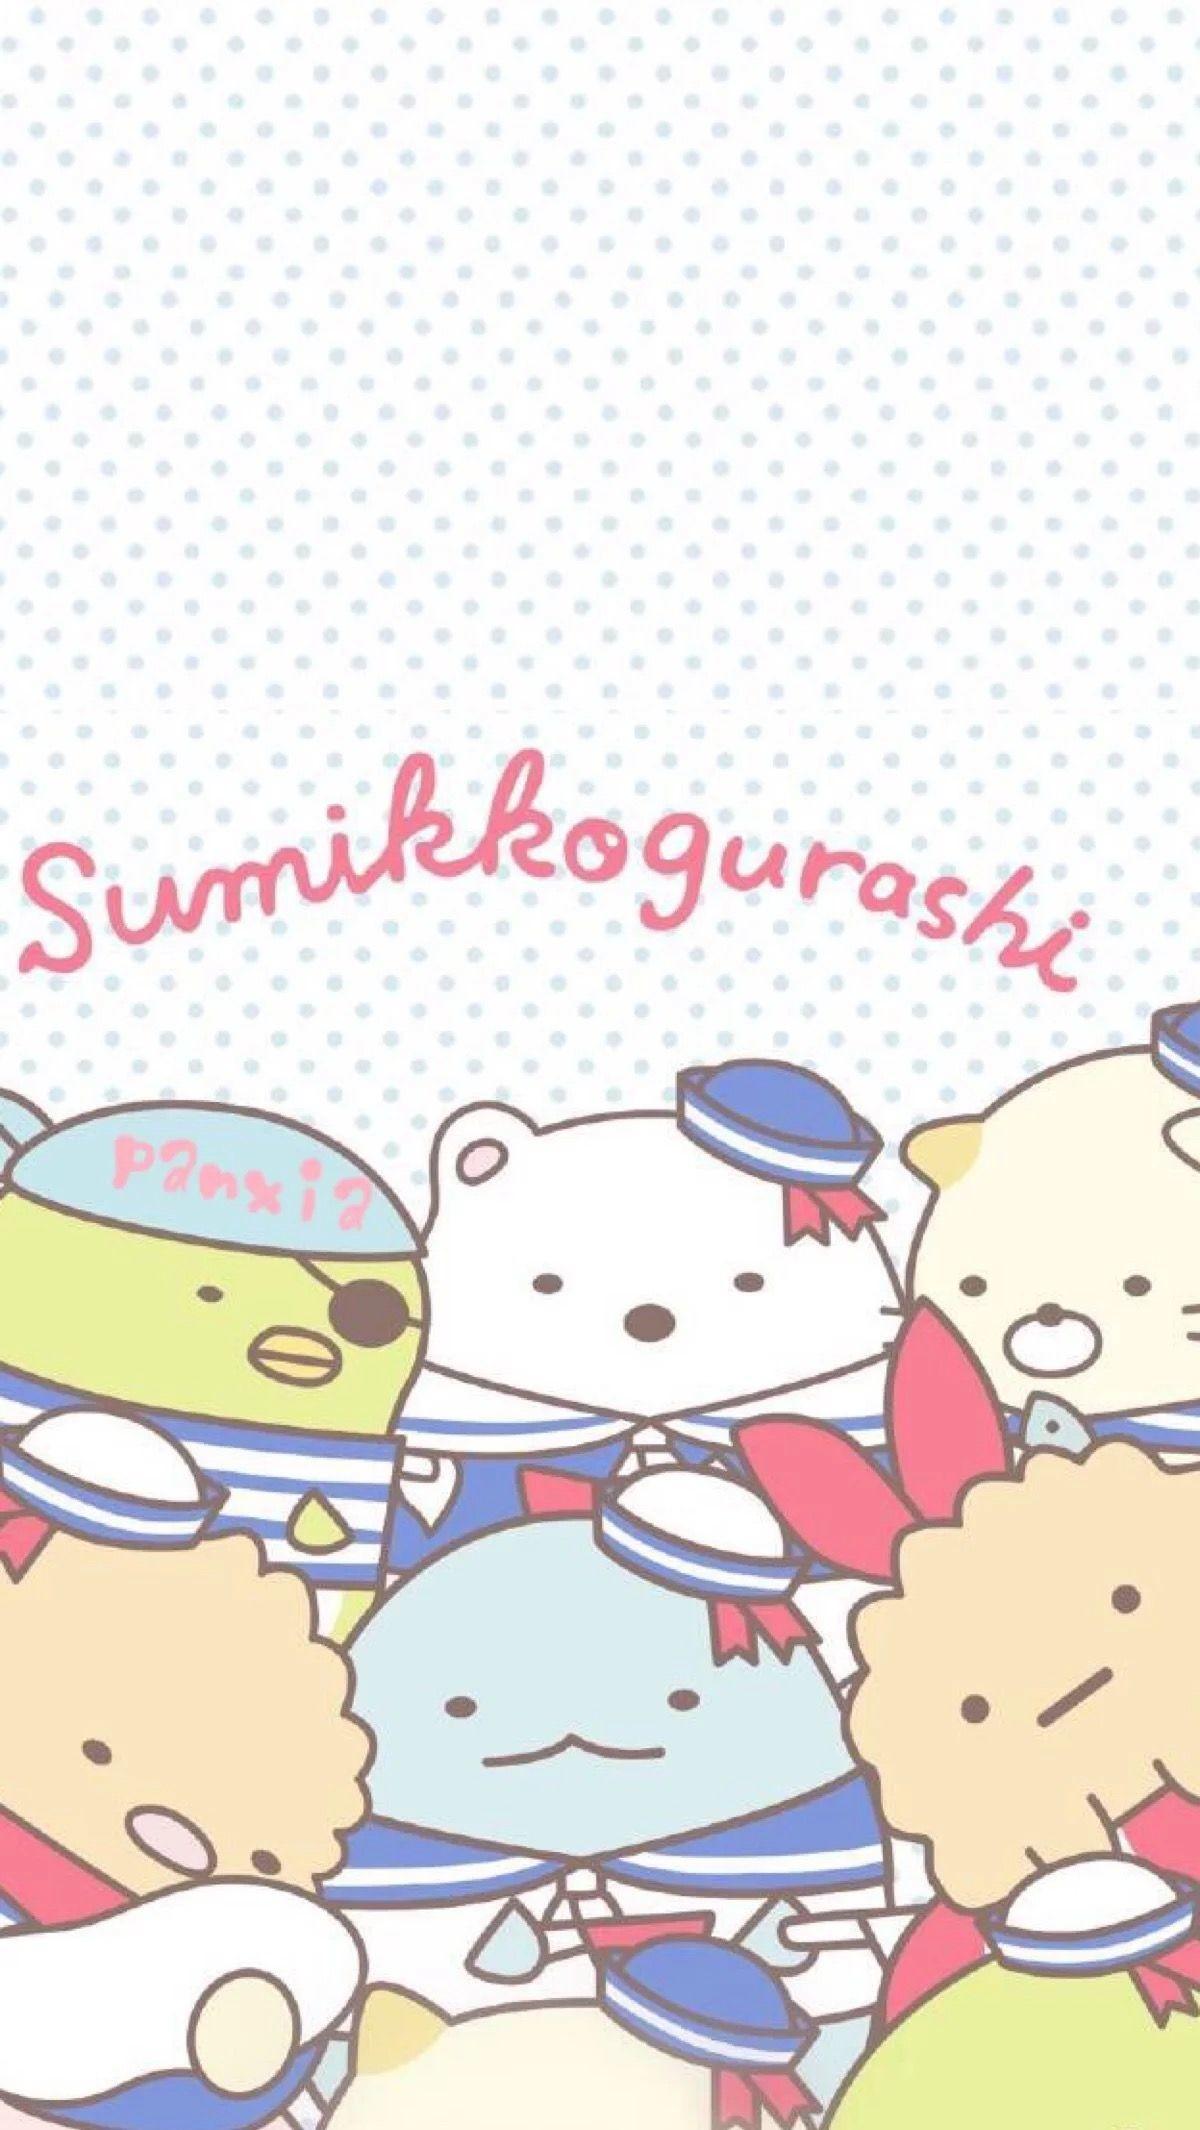 Res: 1200x2130, Sumikko gurashi sailors phone wallpaper